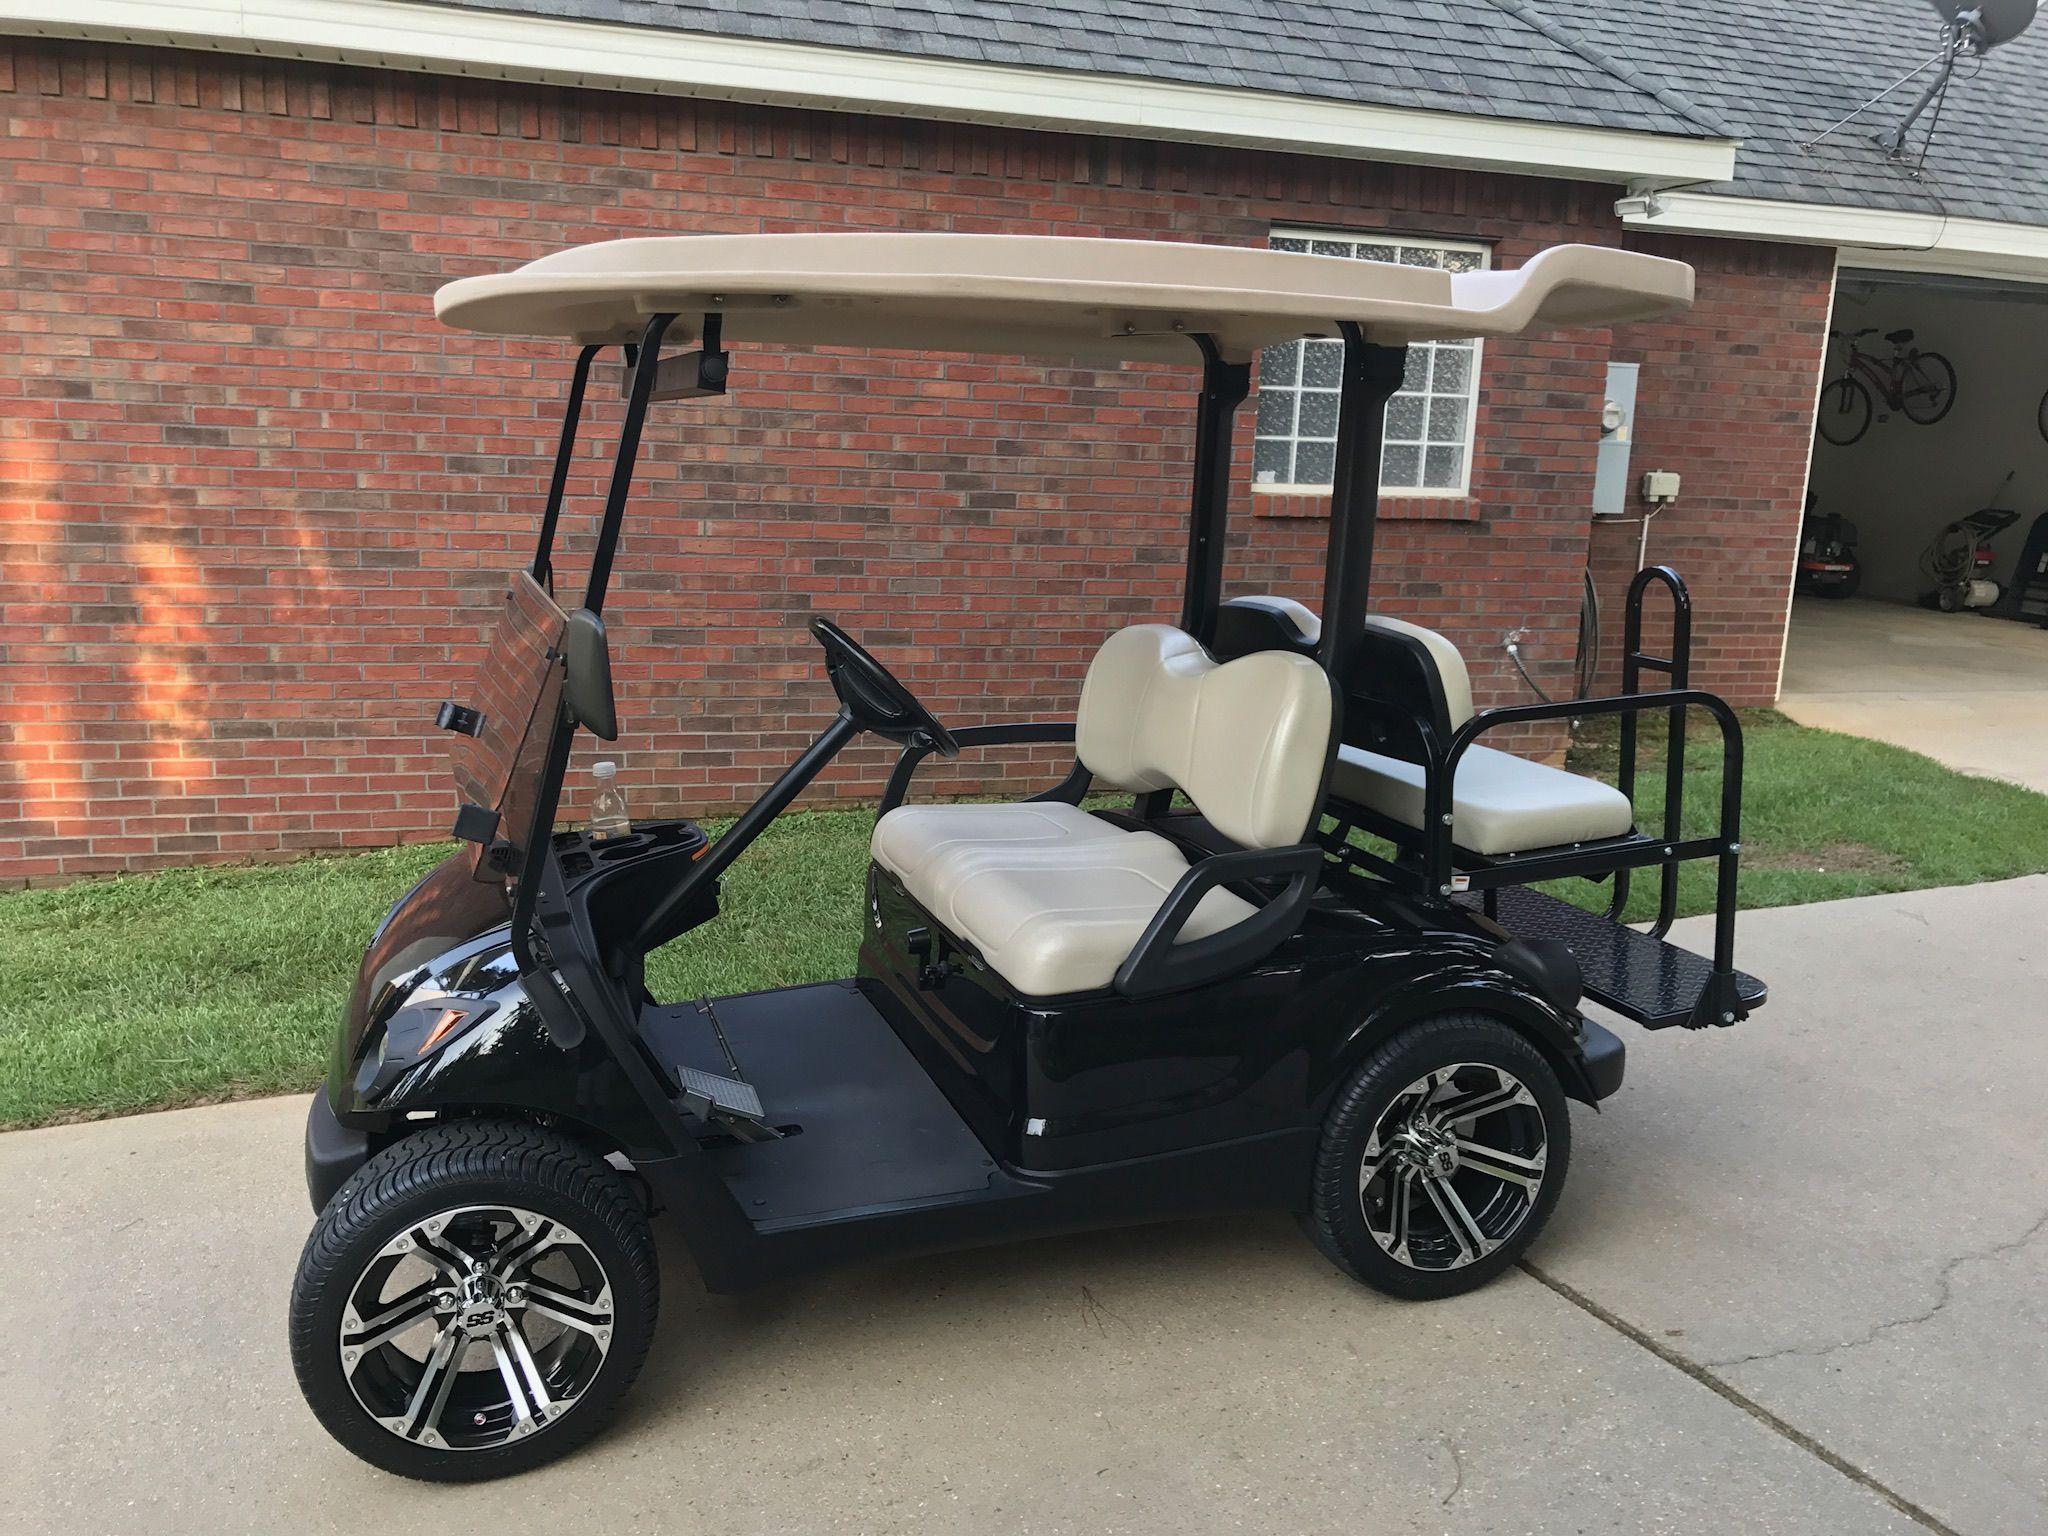 Black Yamaha Golf Cart 2014 Golf Carts Cheap Golf Carts Yamaha Golf Carts